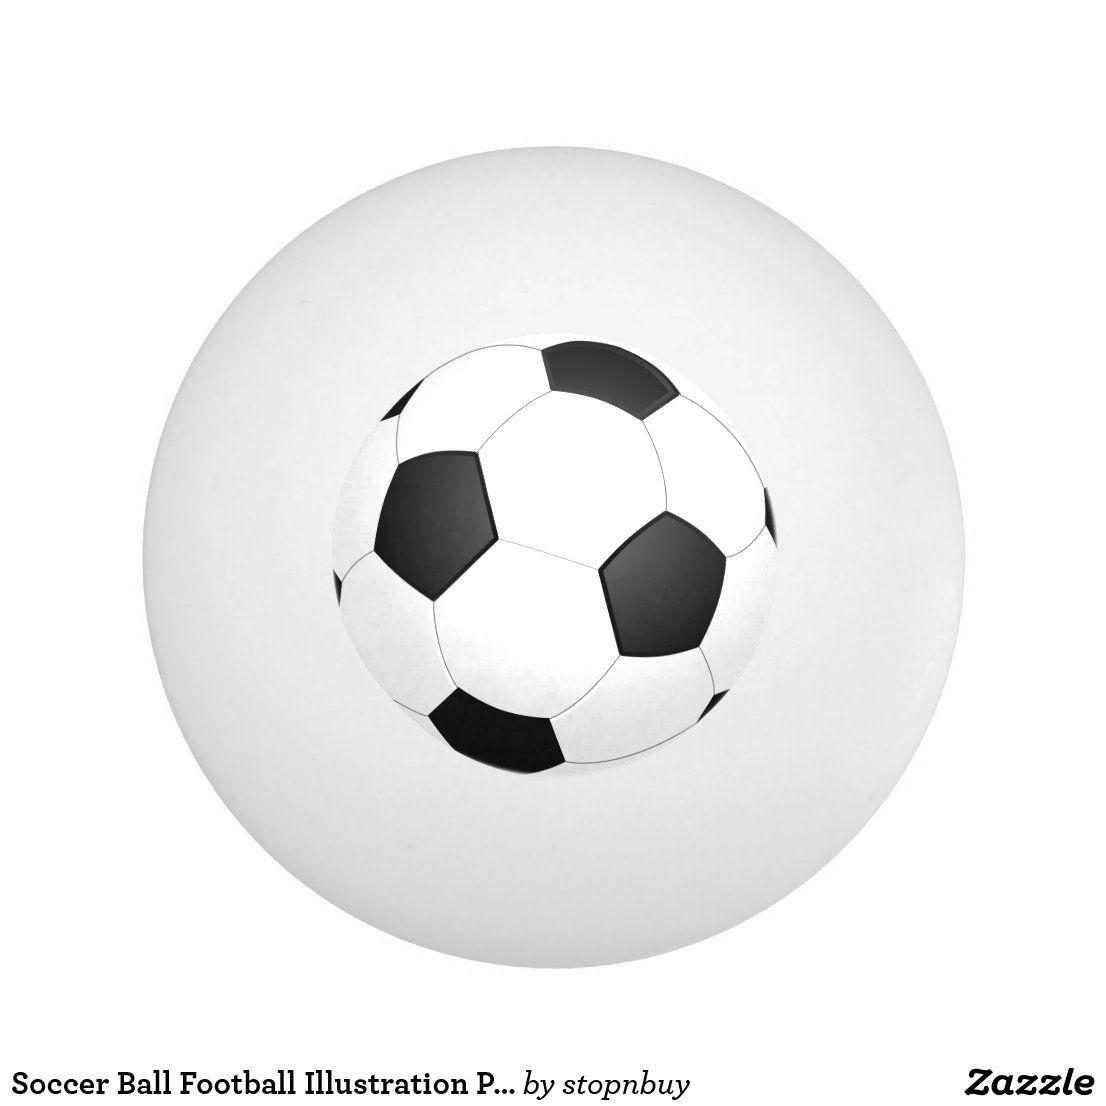 Soccer Ball Football Illustration Ping Pong Ball Zazzle Com Soccer Ball Football Illustration Soccer